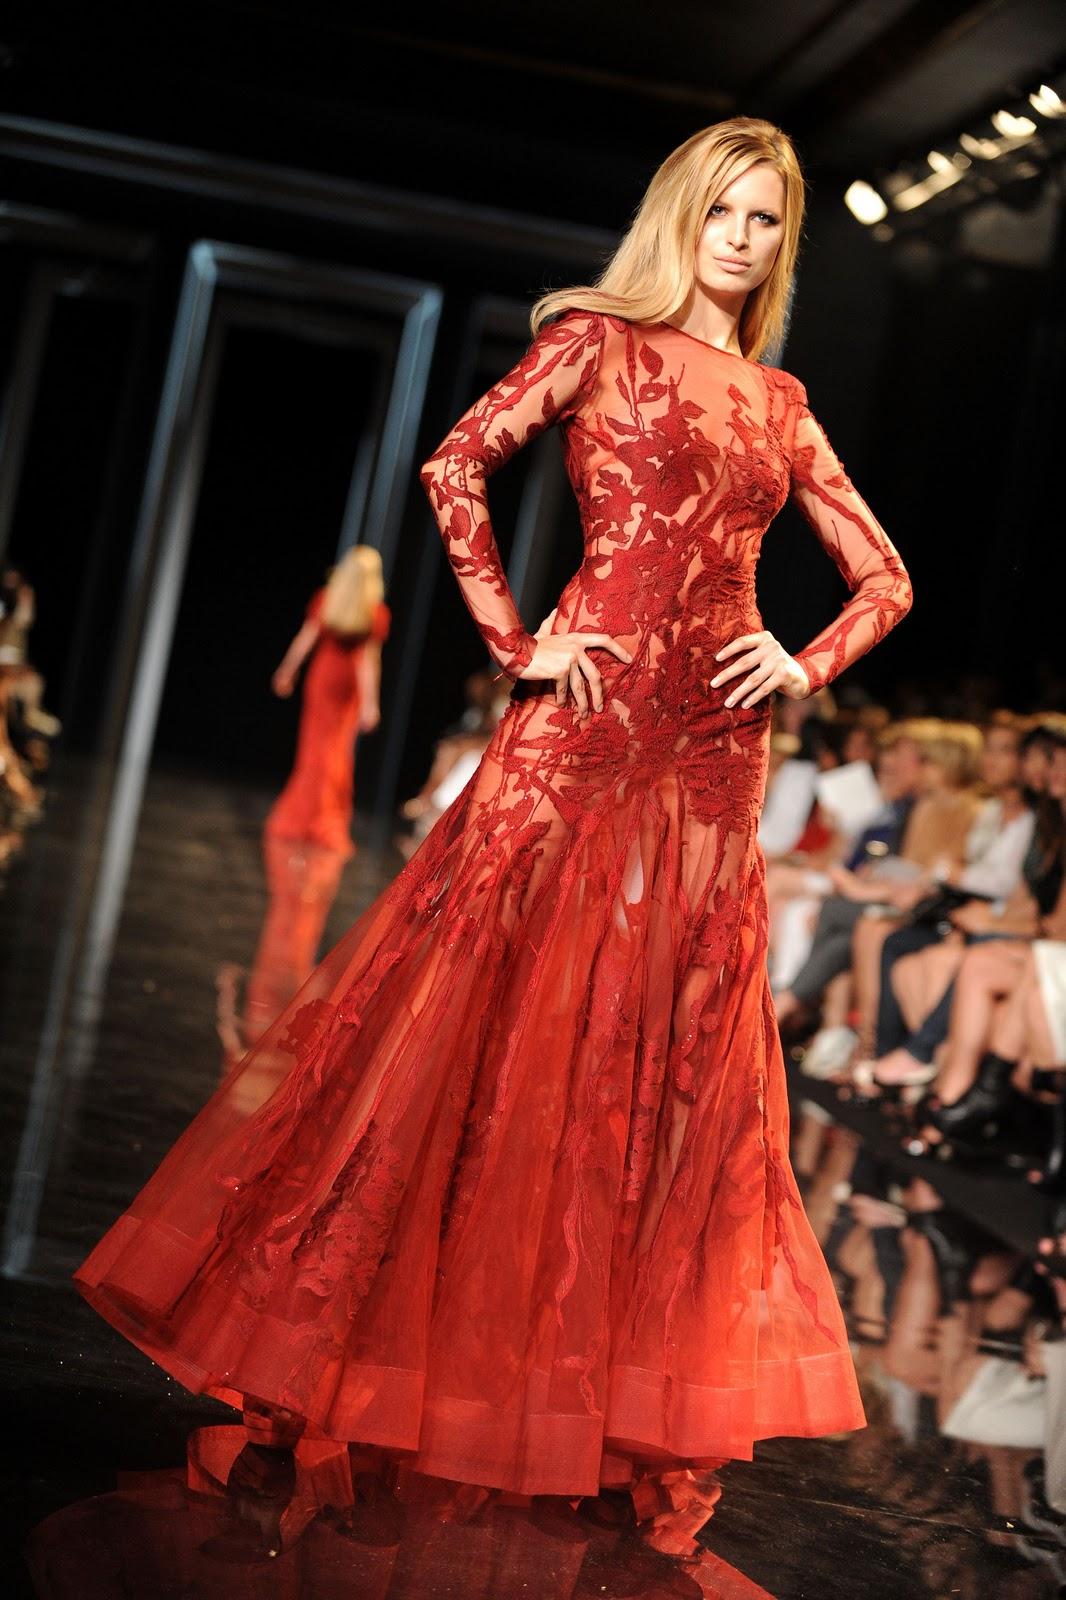 http://1.bp.blogspot.com/-V9GYGKBz3-E/TqKsjyuyVuI/AAAAAAAABaY/Wyp1kn5Awhs/s1600/karolina-kurkova-2010-2011-fashion-show-elie-saab-haute-couture-fallwinter-20.jpg